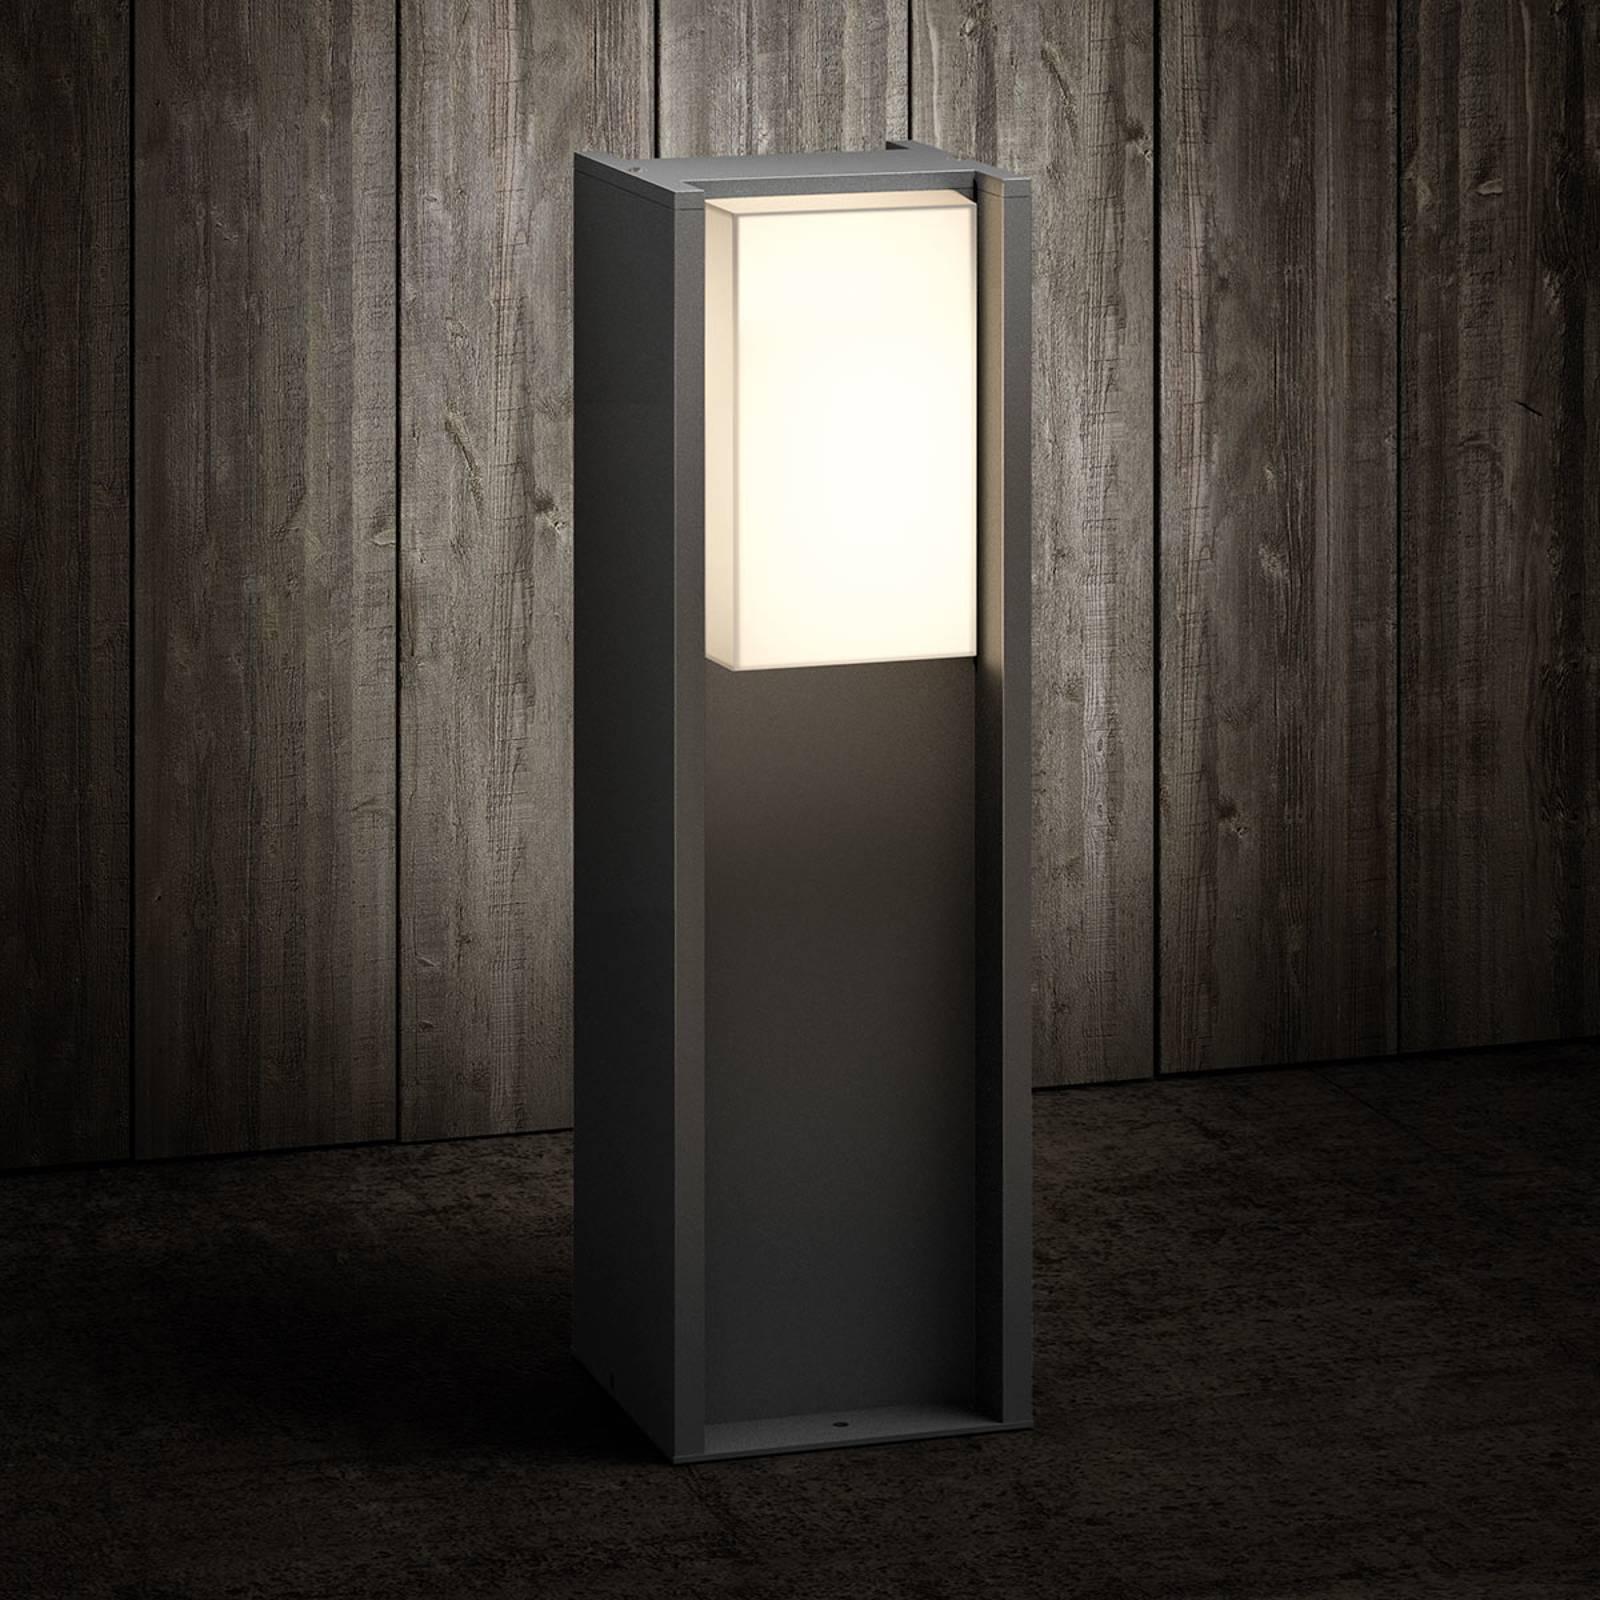 Philips Hue LED buitenwandlamp Turaco - instelbaar